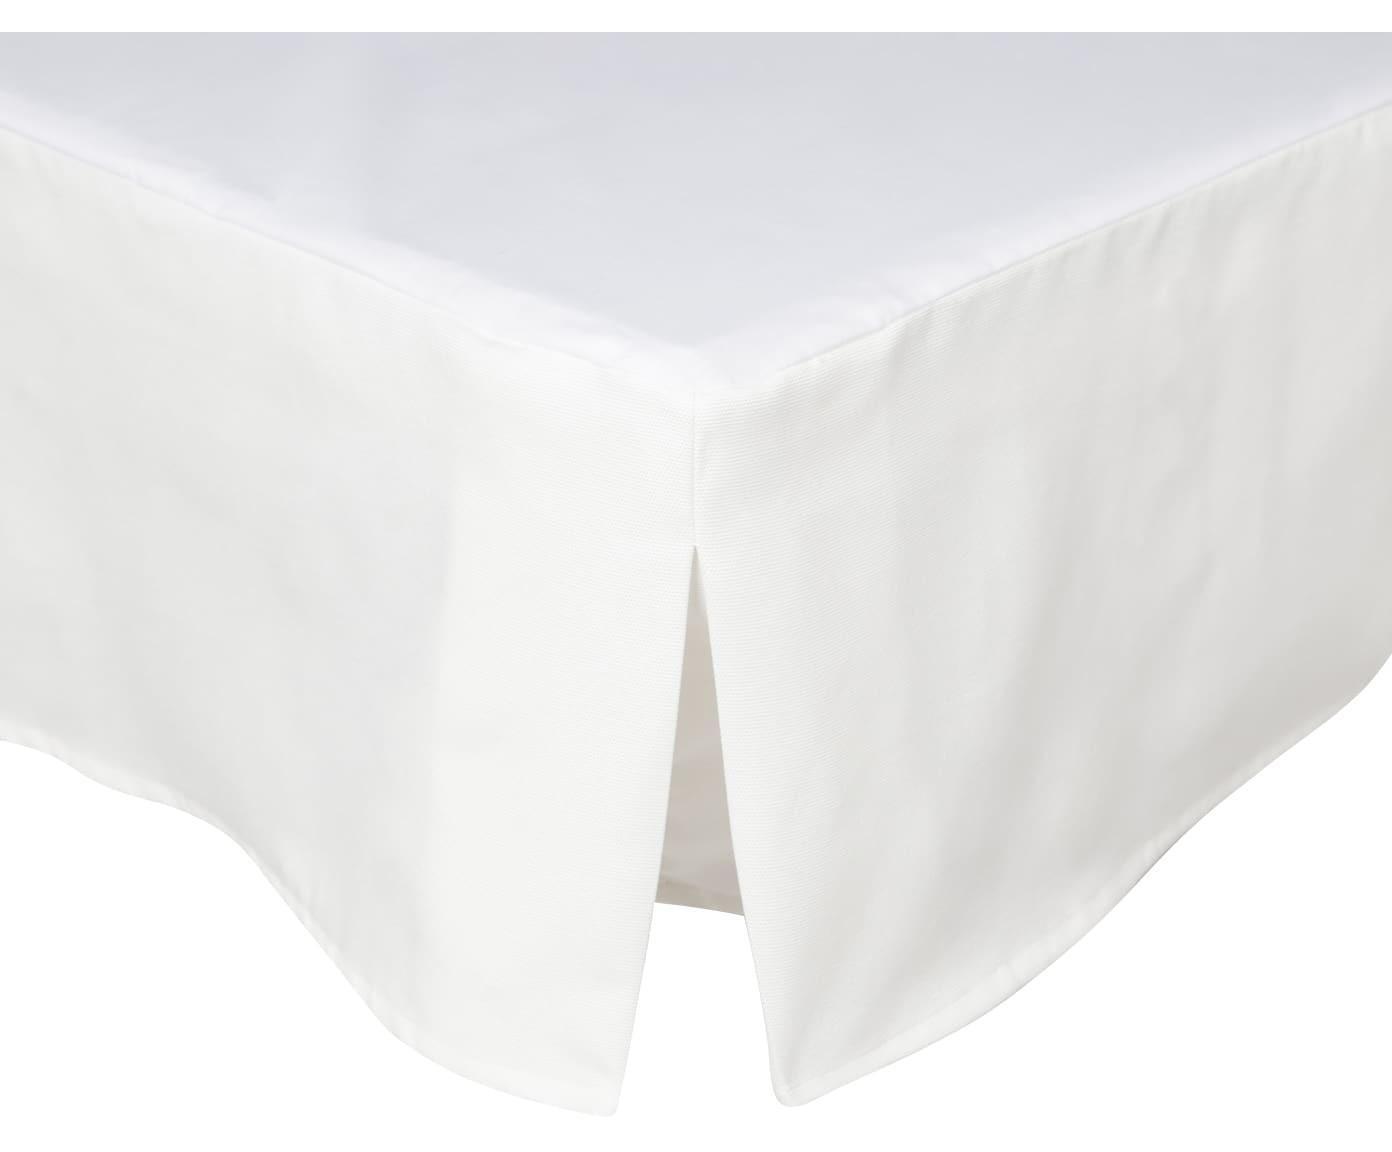 Cubrecanapé Panama, Blanco, Cama 80 cm (80 x 200 cm)